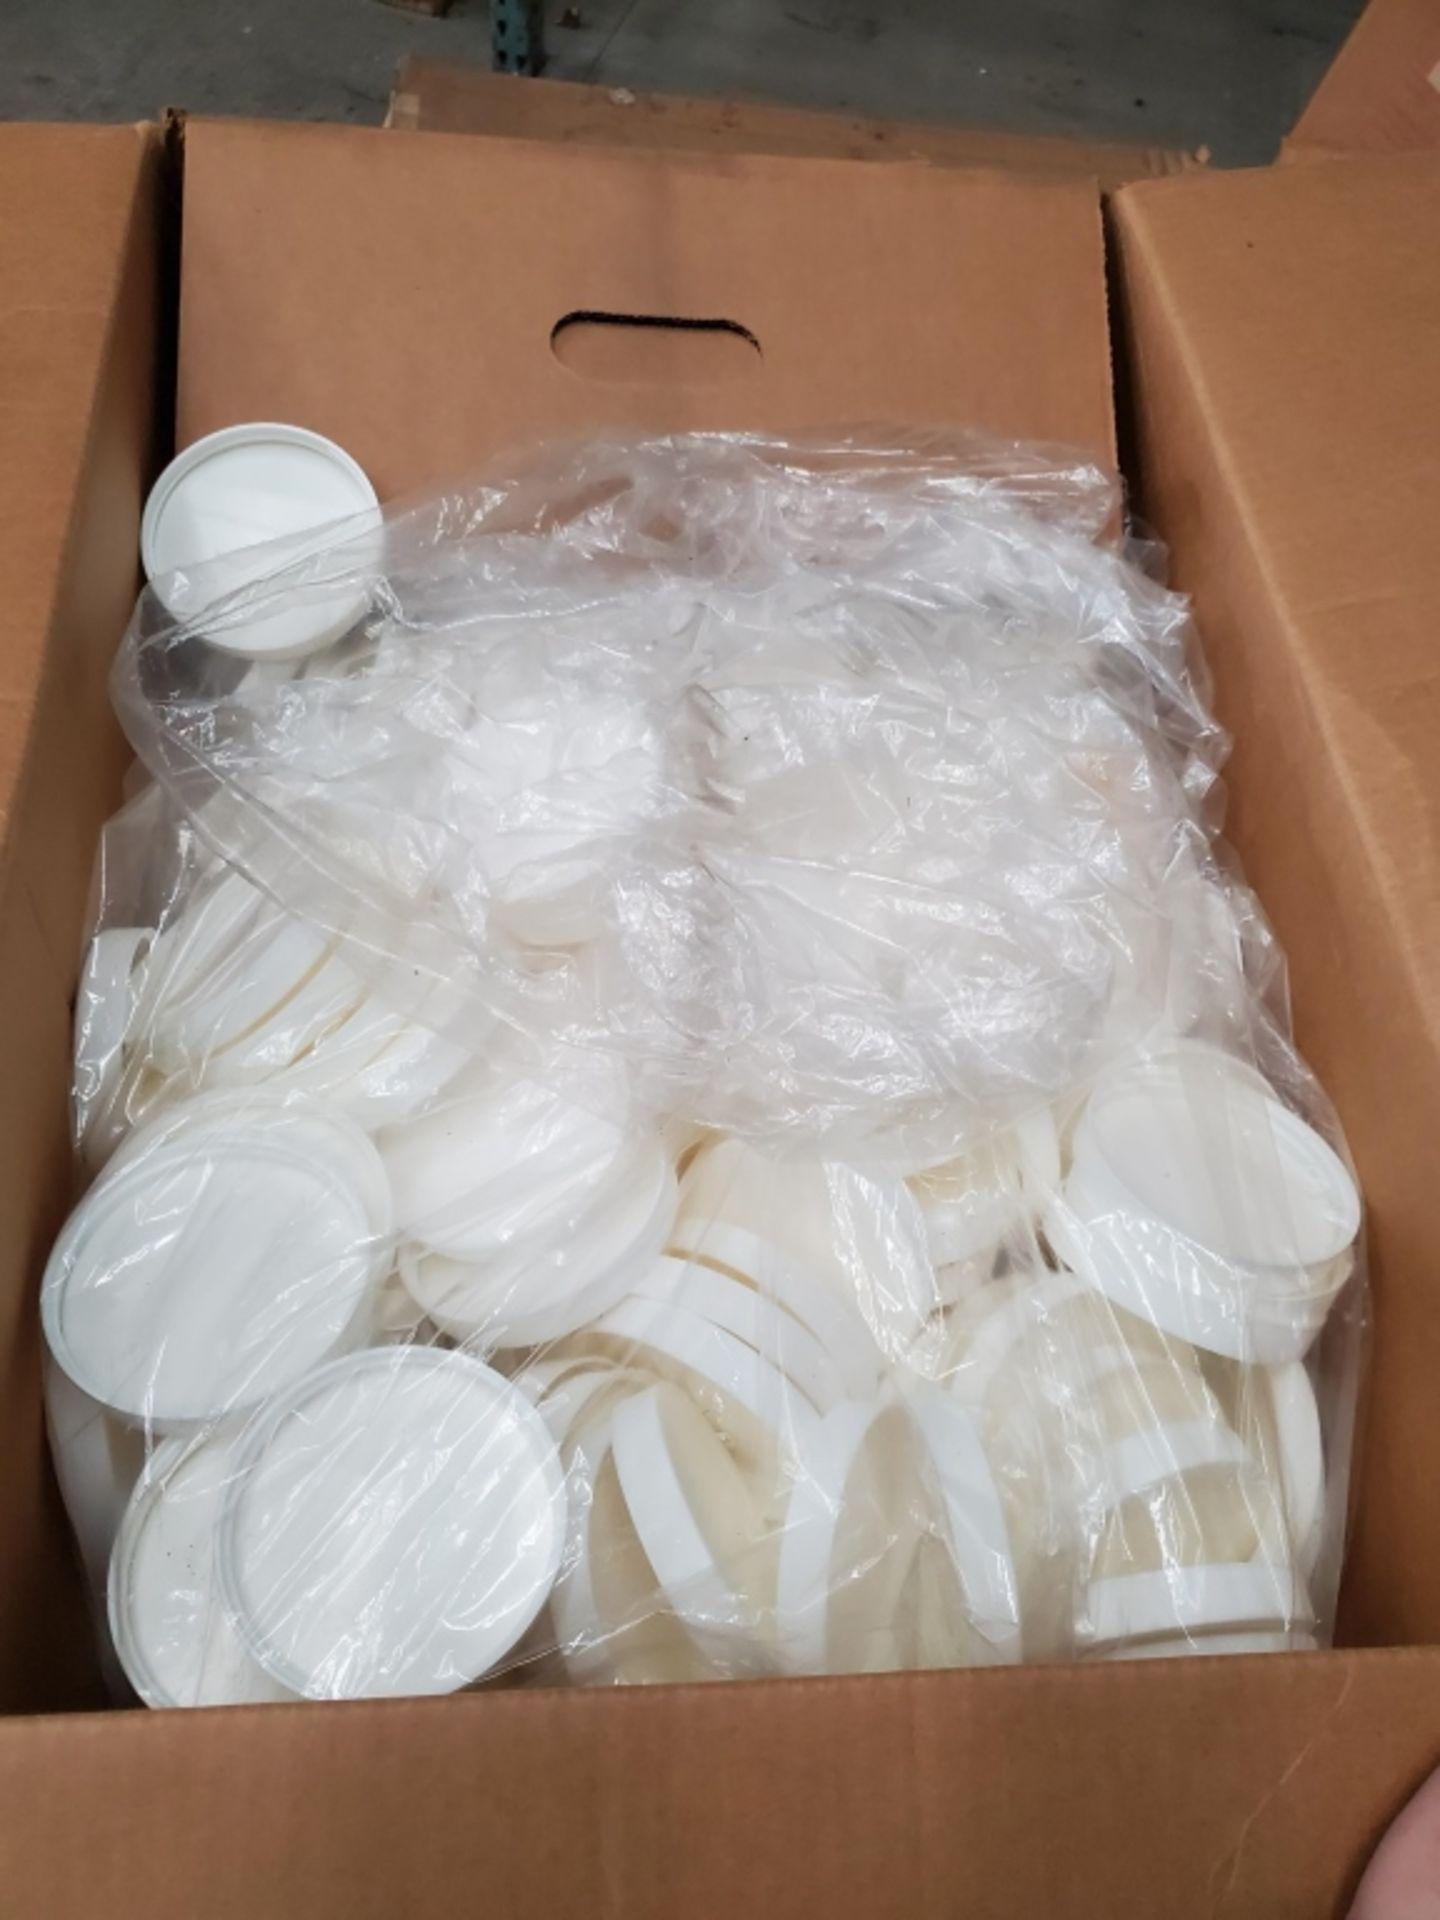 Skid Lot of Various Sized Plastic Bottles - Image 3 of 6